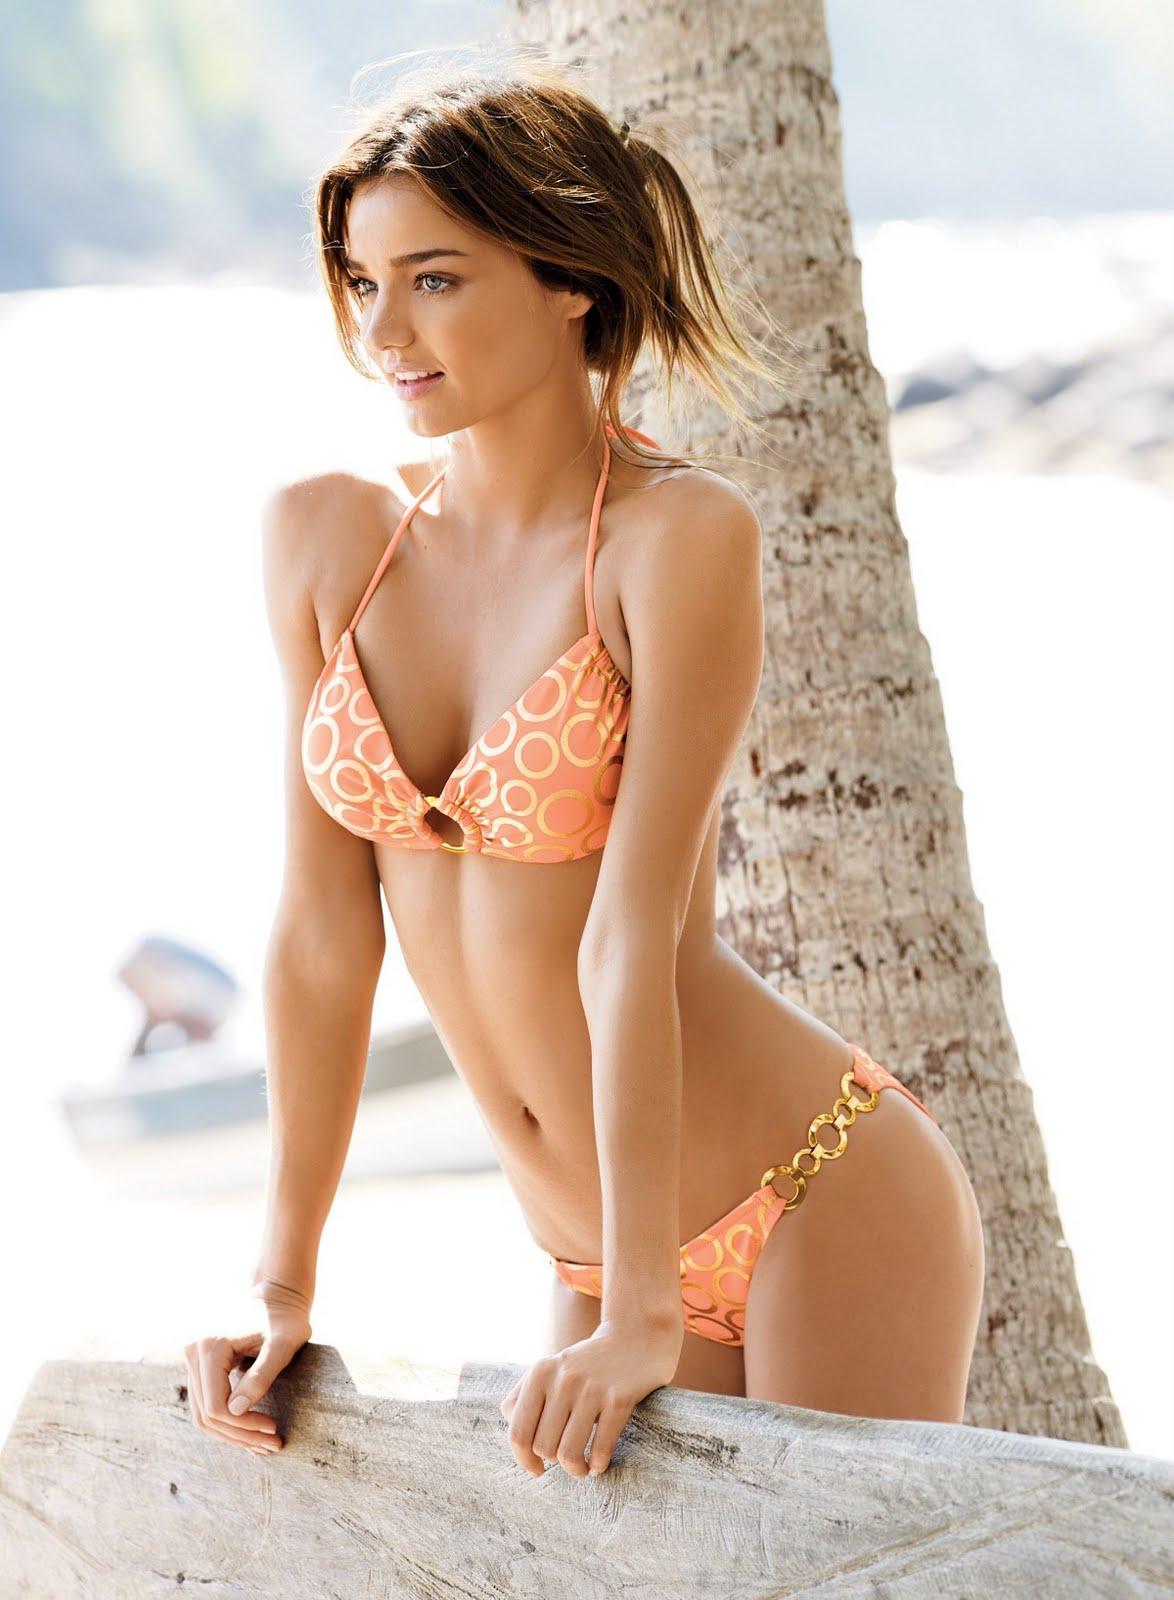 http://4.bp.blogspot.com/-2ag3XlIlv5c/TfecxUfOapI/AAAAAAAAAS0/MtEAx-MXyHI/s1600/miranda-kerr-bikini_001.jpg